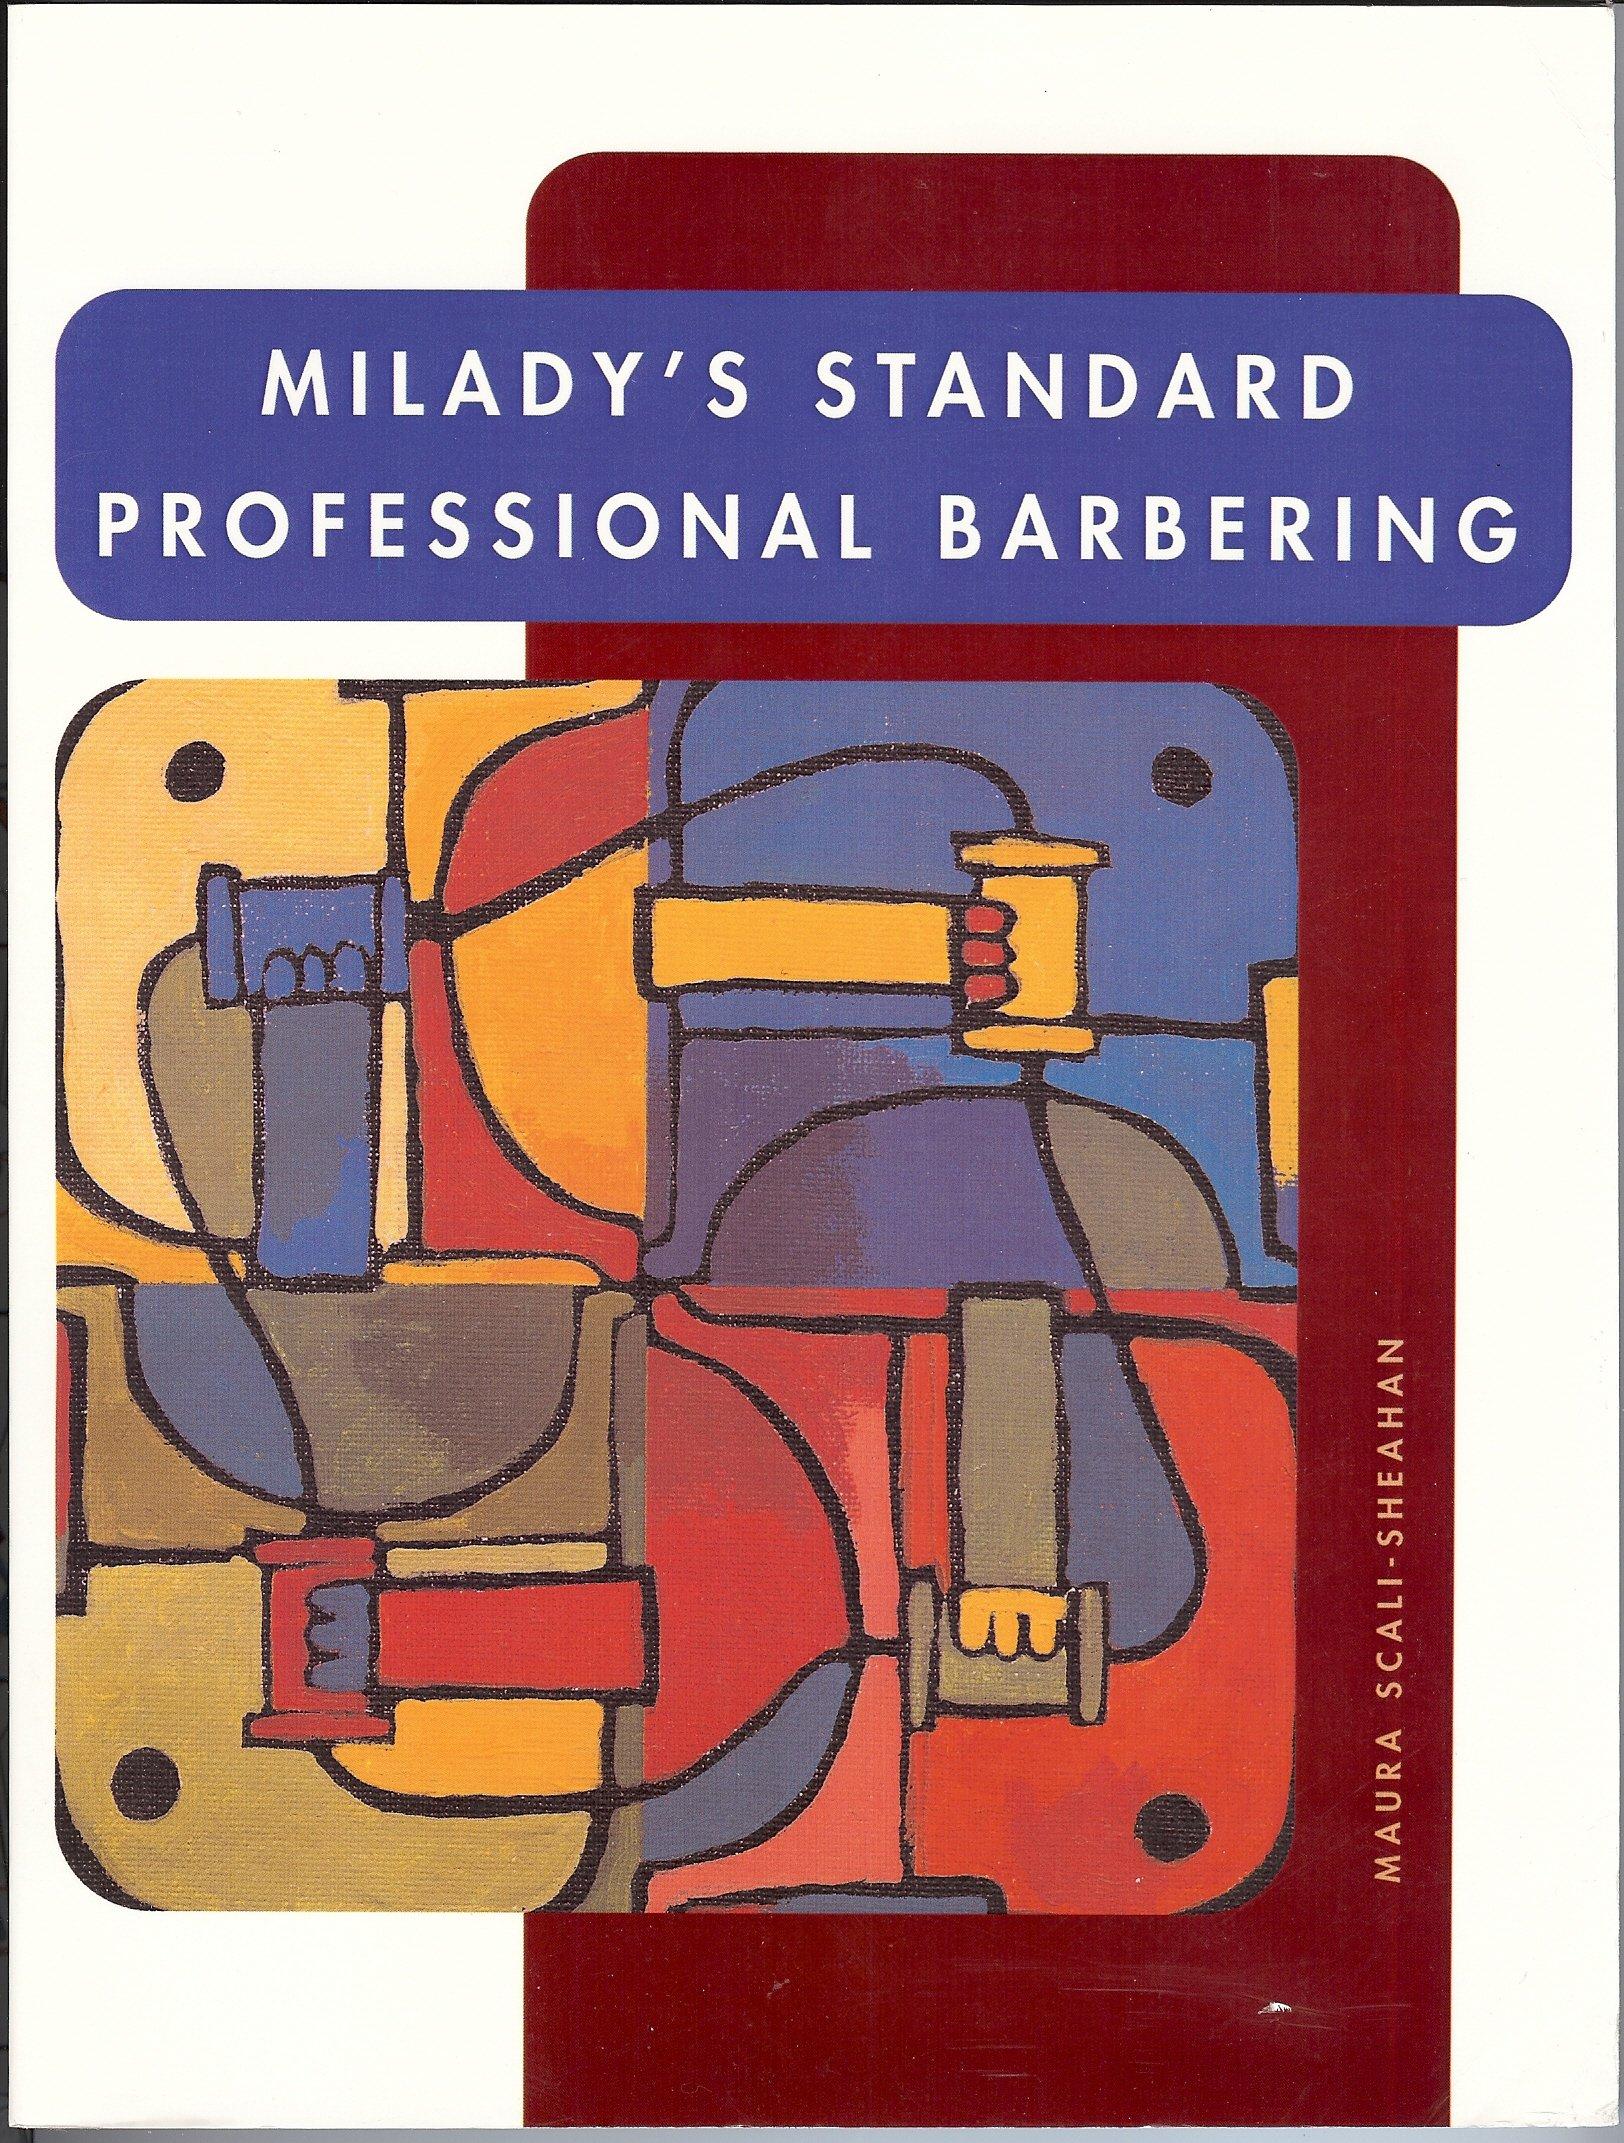 Download Milady's Standard Professional Barbering ebook